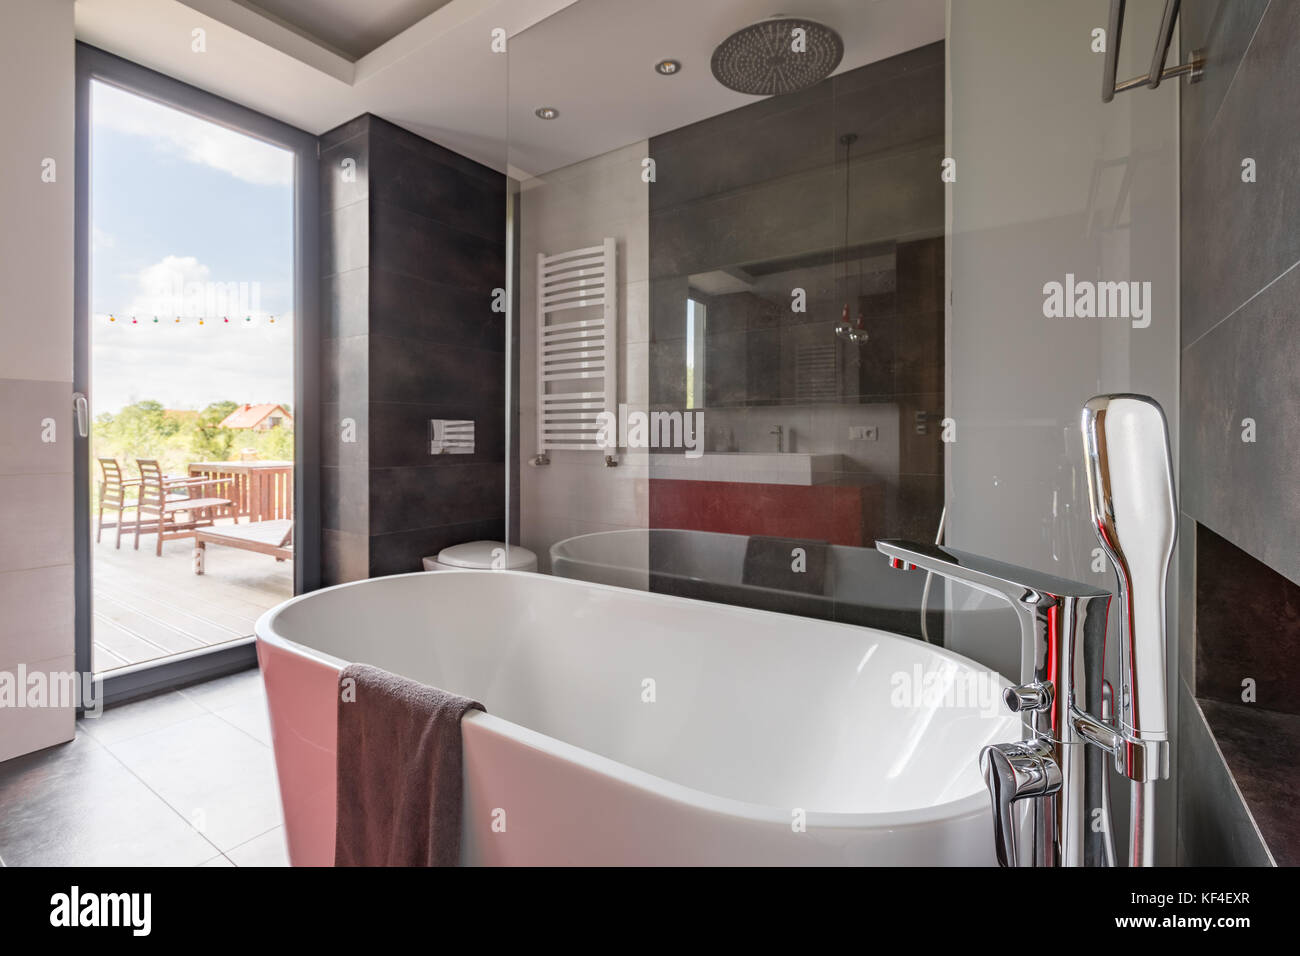 Luxurious bathroom with big bathtub and balcony door Stock Photo ...